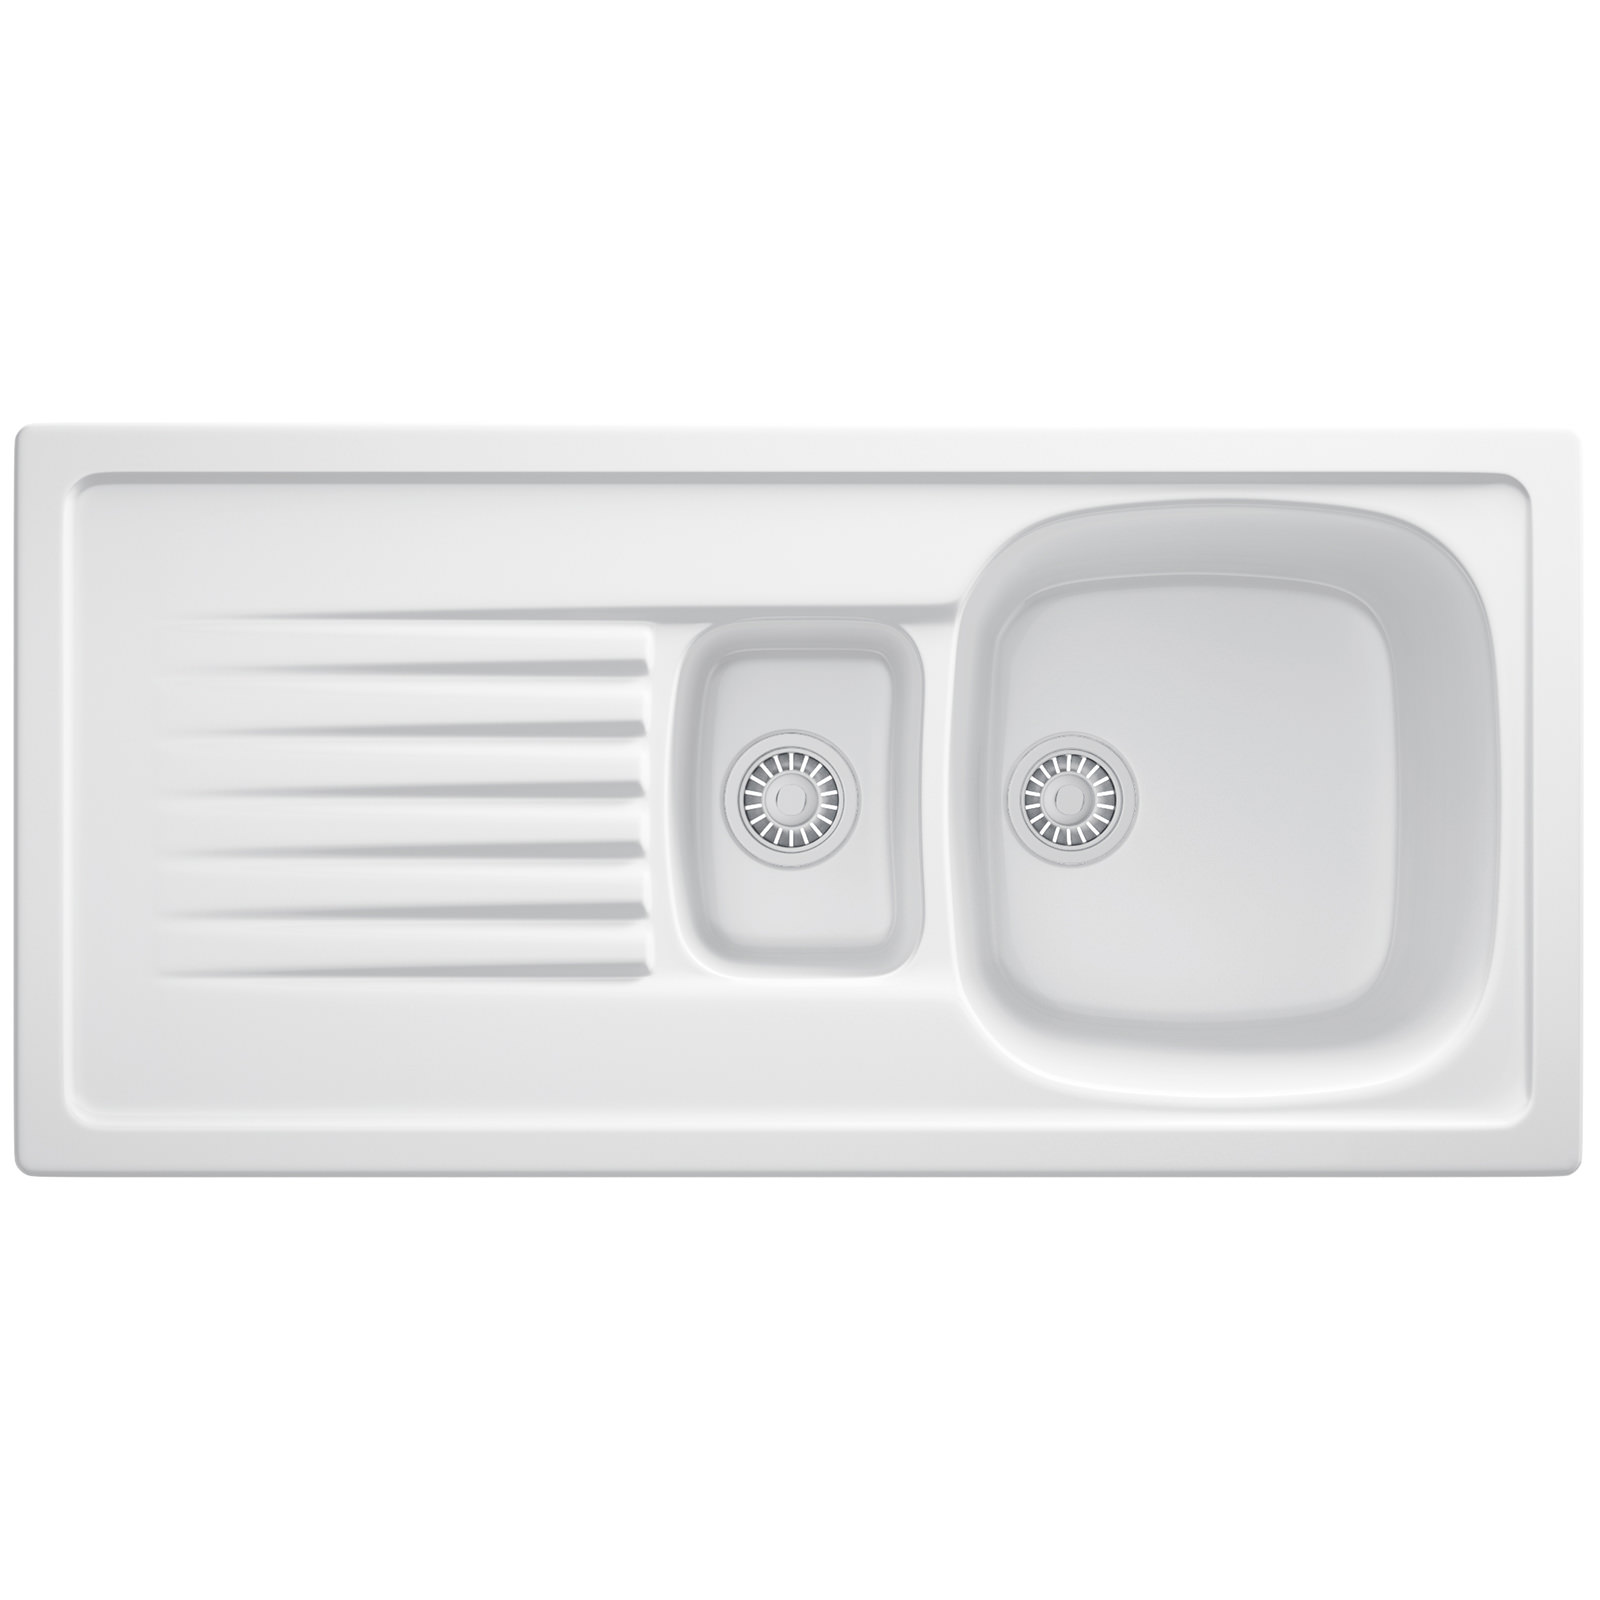 Franke Elba ELK 651 Ceramic White 1.5 Bowl Inset Sink | 124.0184.409